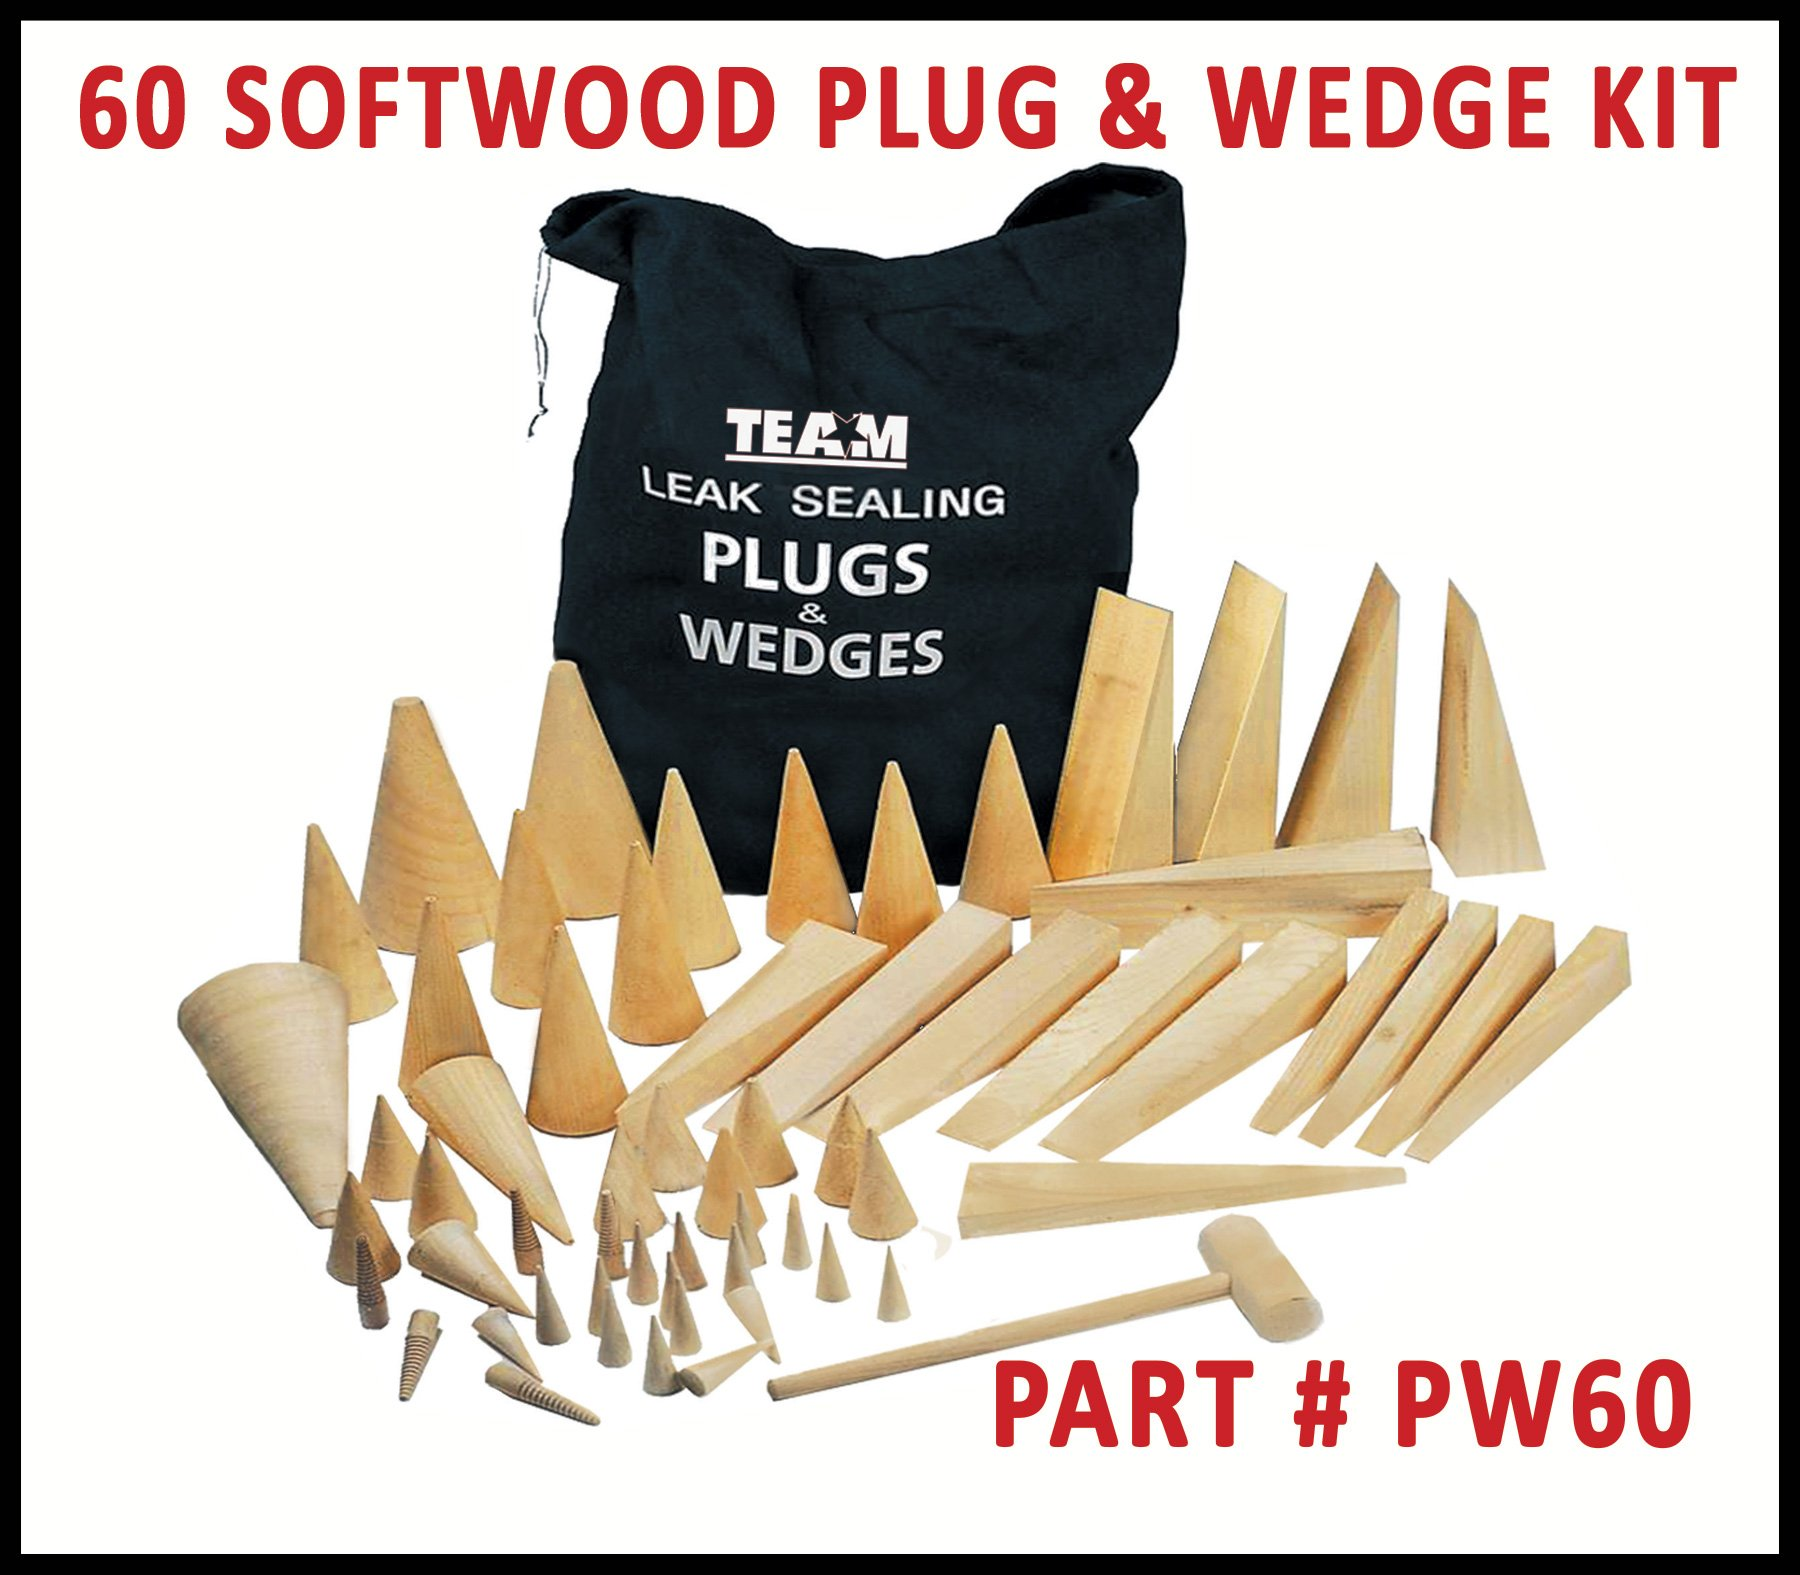 TEAM PW60 Plug and Wedge Kit